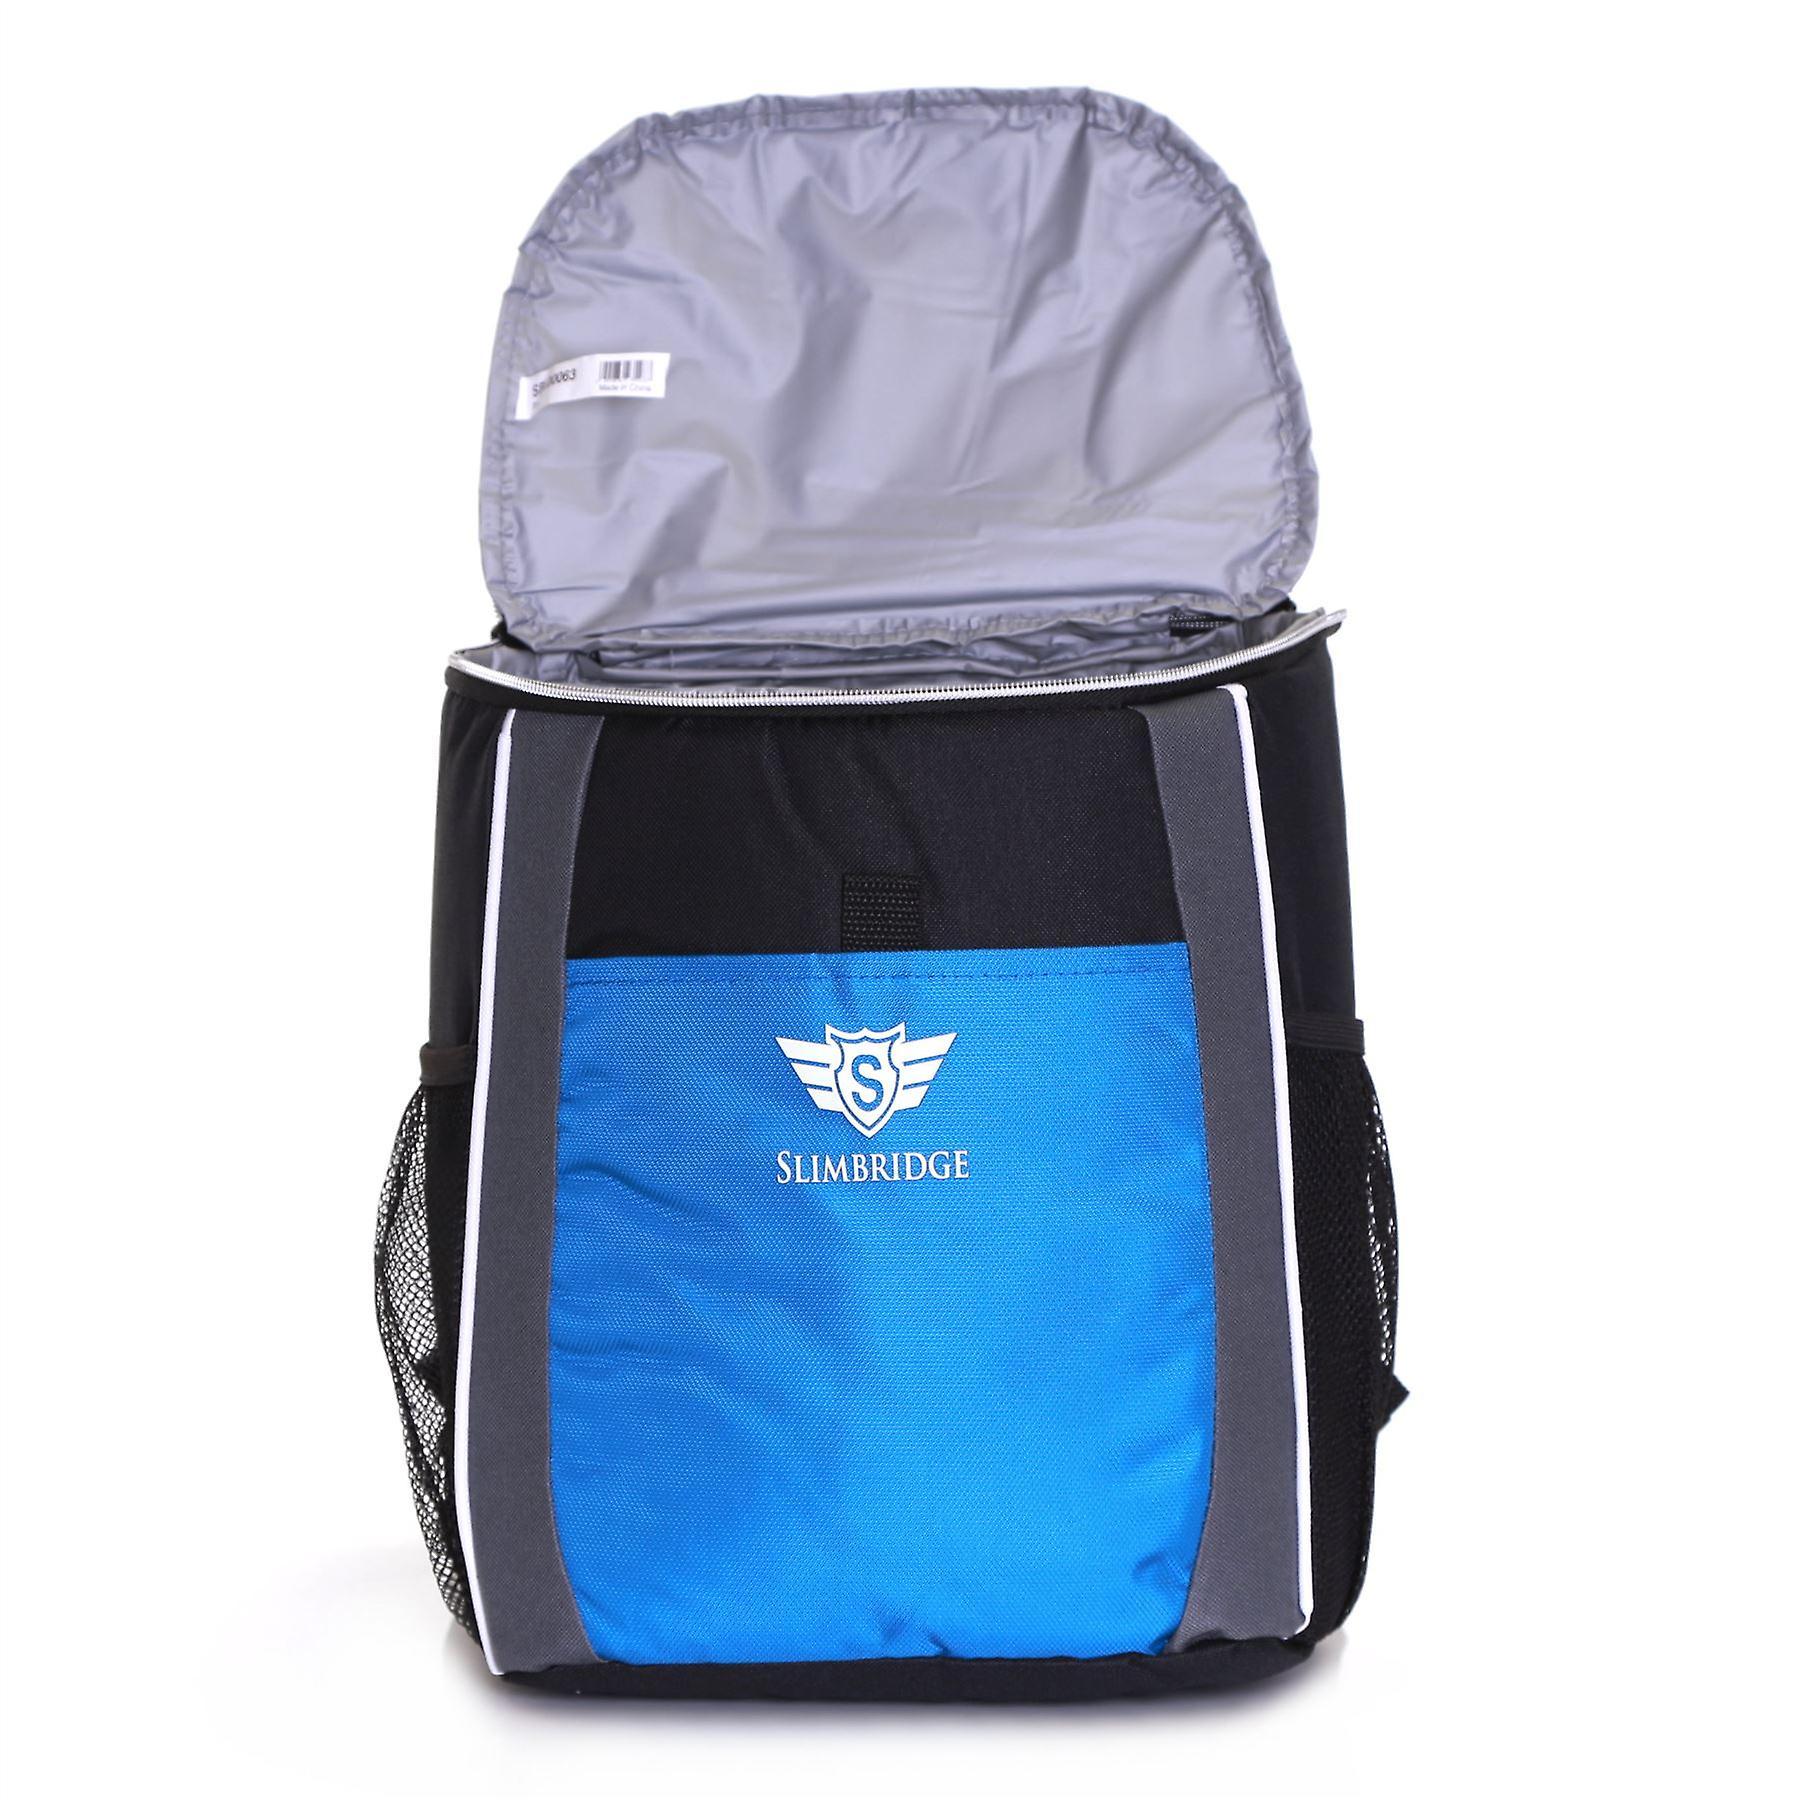 Slimbridge Brean Insulated Picnic Backpack, Blue